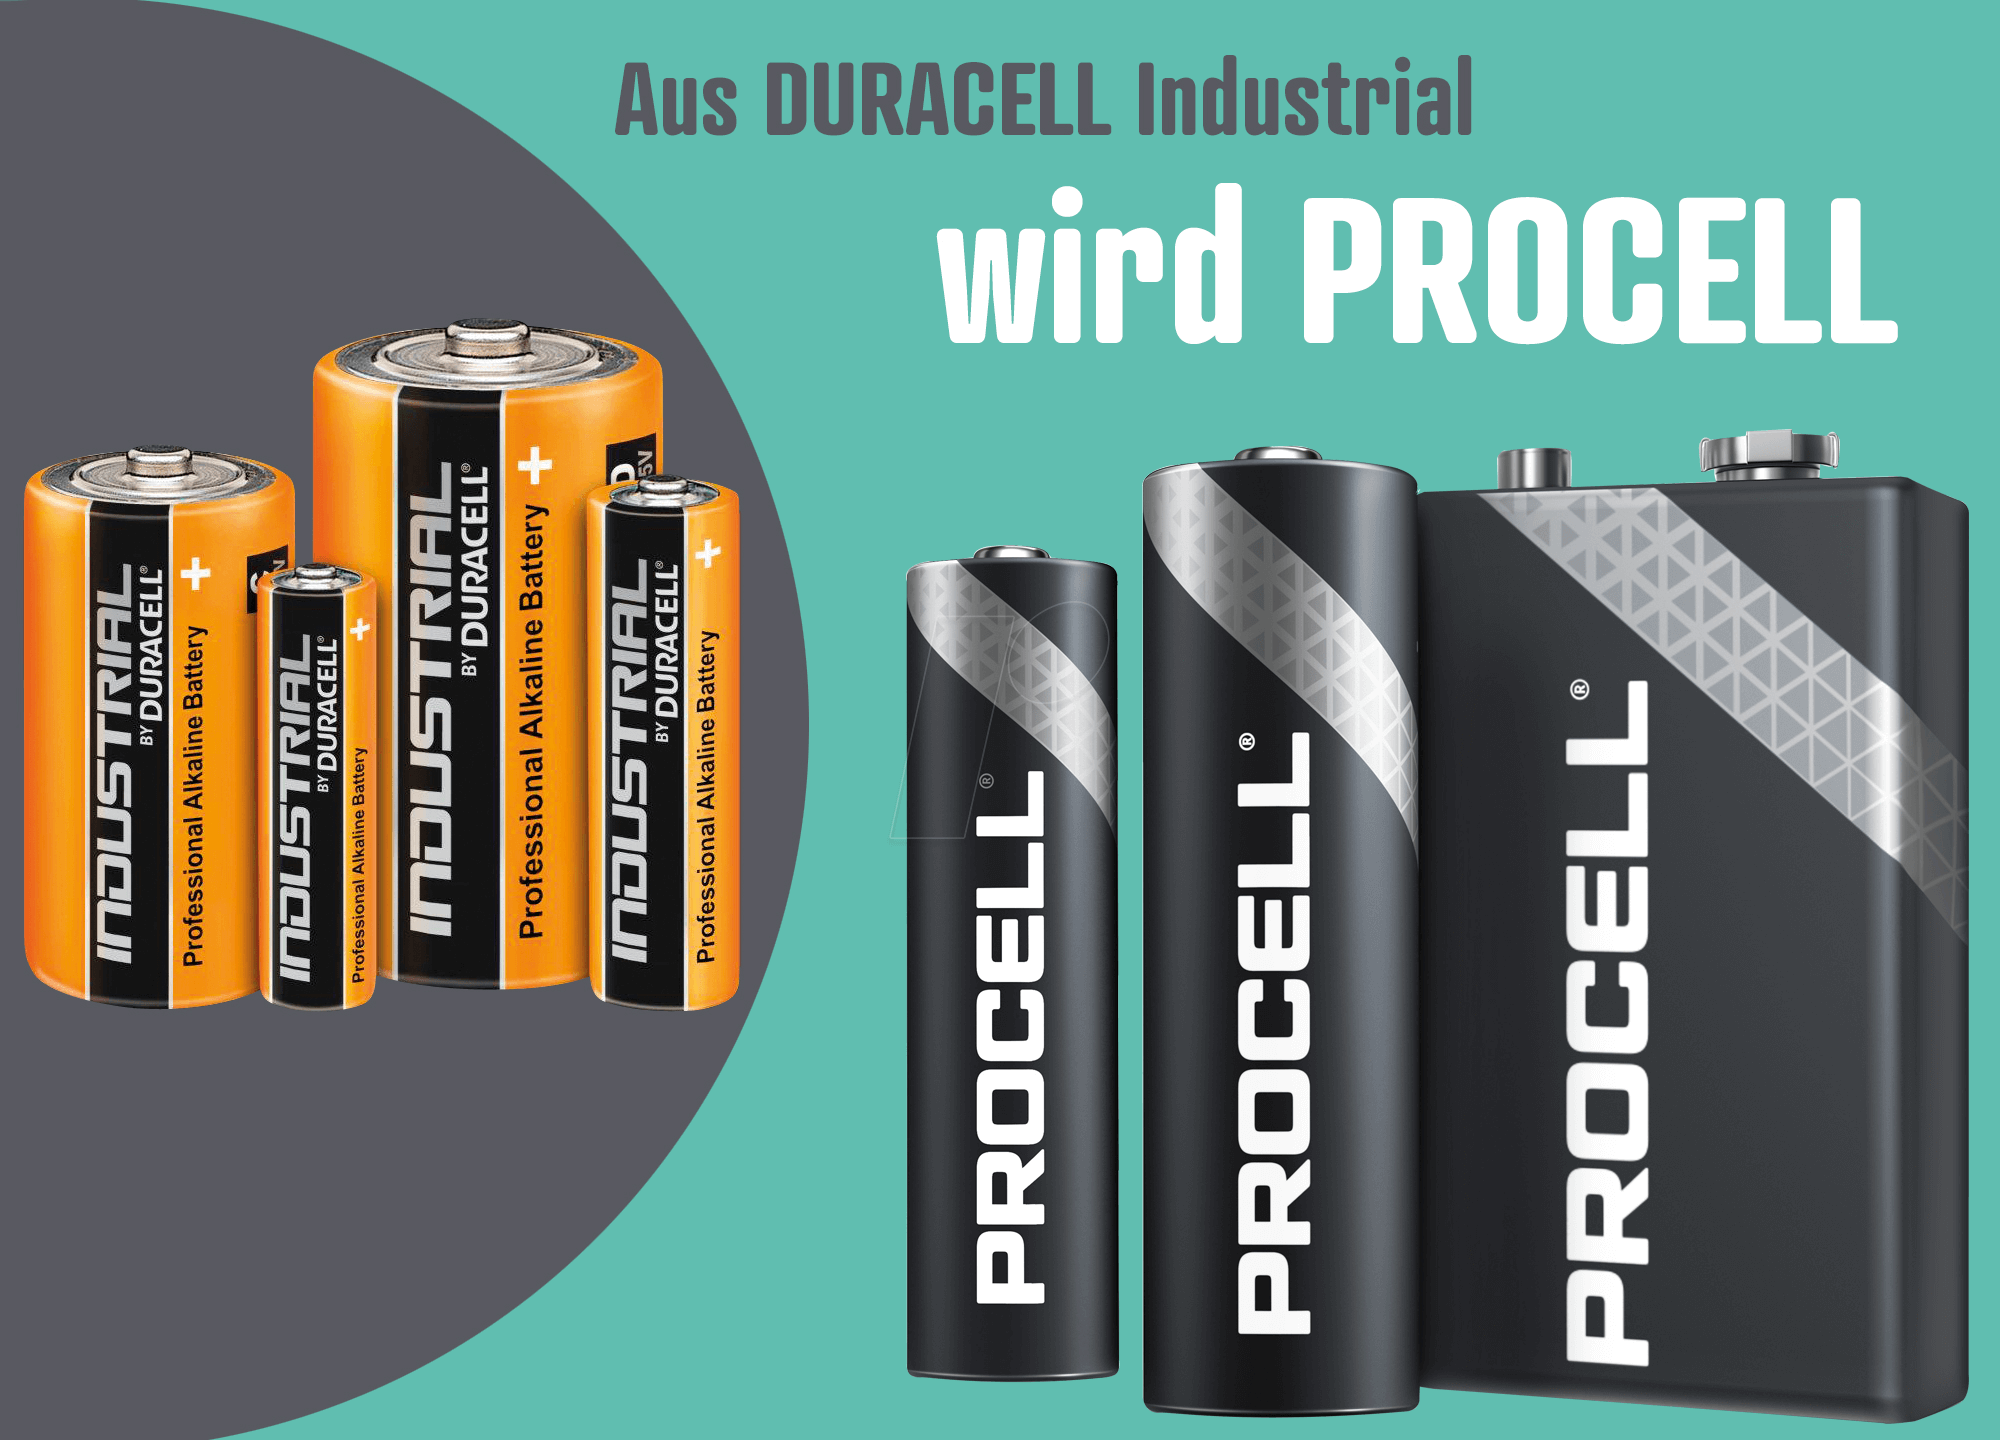 20 x DURACELL Industrial 9V Block MN1604 6LR61 Batterien der PROCELL Nachfolger